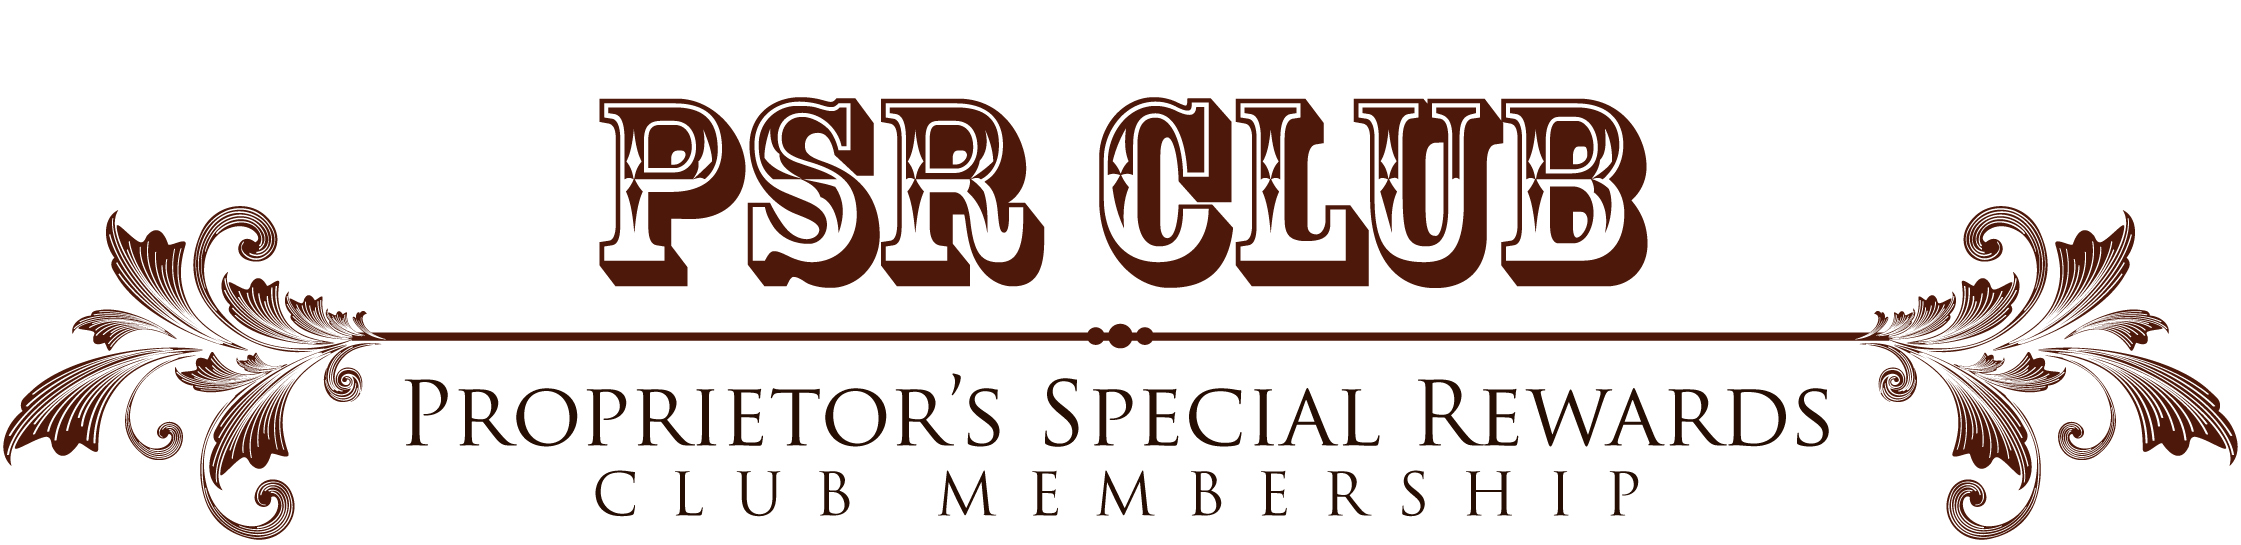 psr club logo